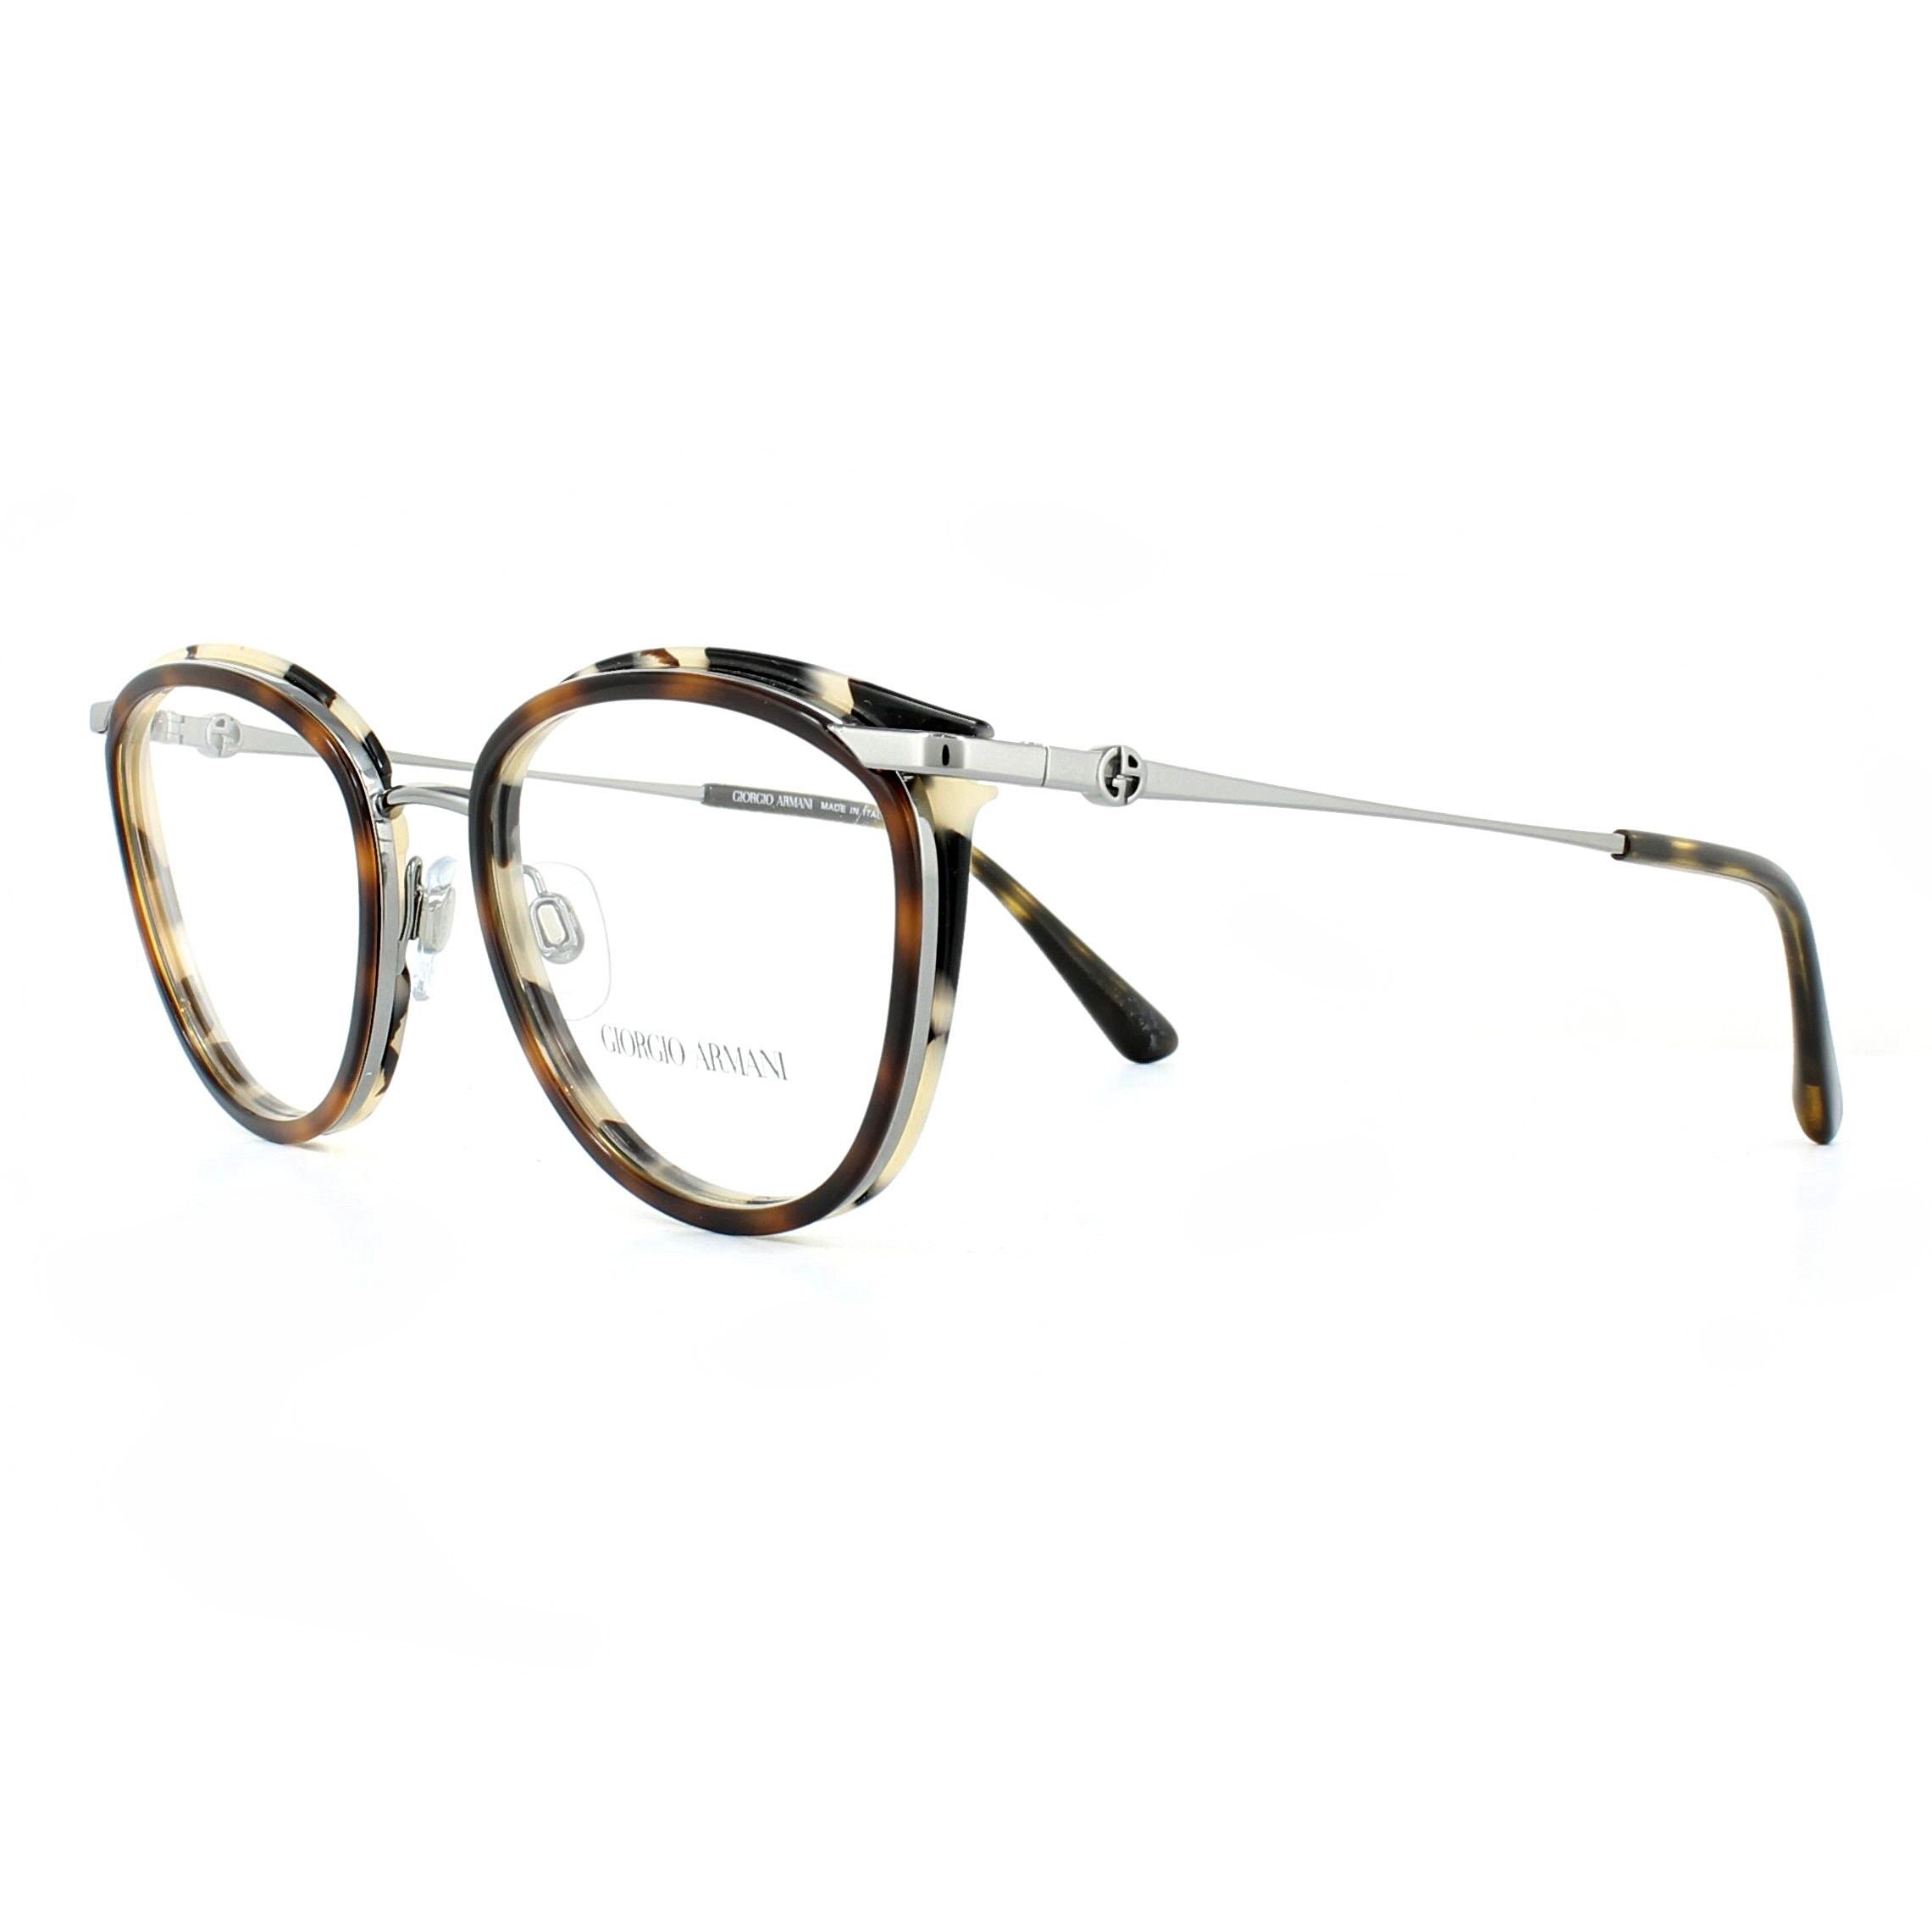 d99f413c792 Sentinel Giorgio Armani Glasses Frames AR5074 3010 Gunmetal Grey and Havana  52mm Womens